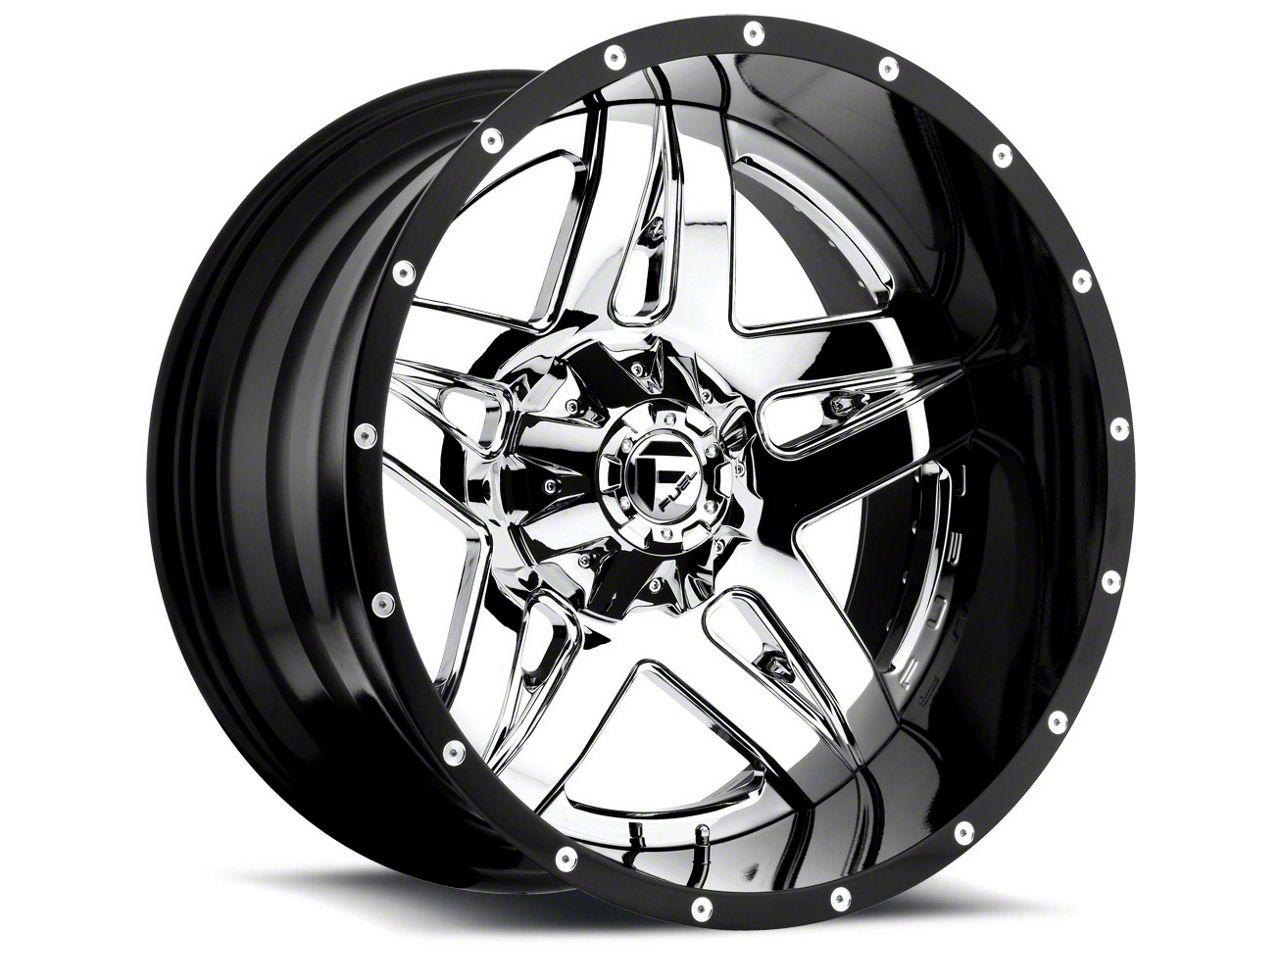 Fuel Wheels Full Blown Chrome 6-Lug Wheel - 22x12 (07-18 Sierra 1500)